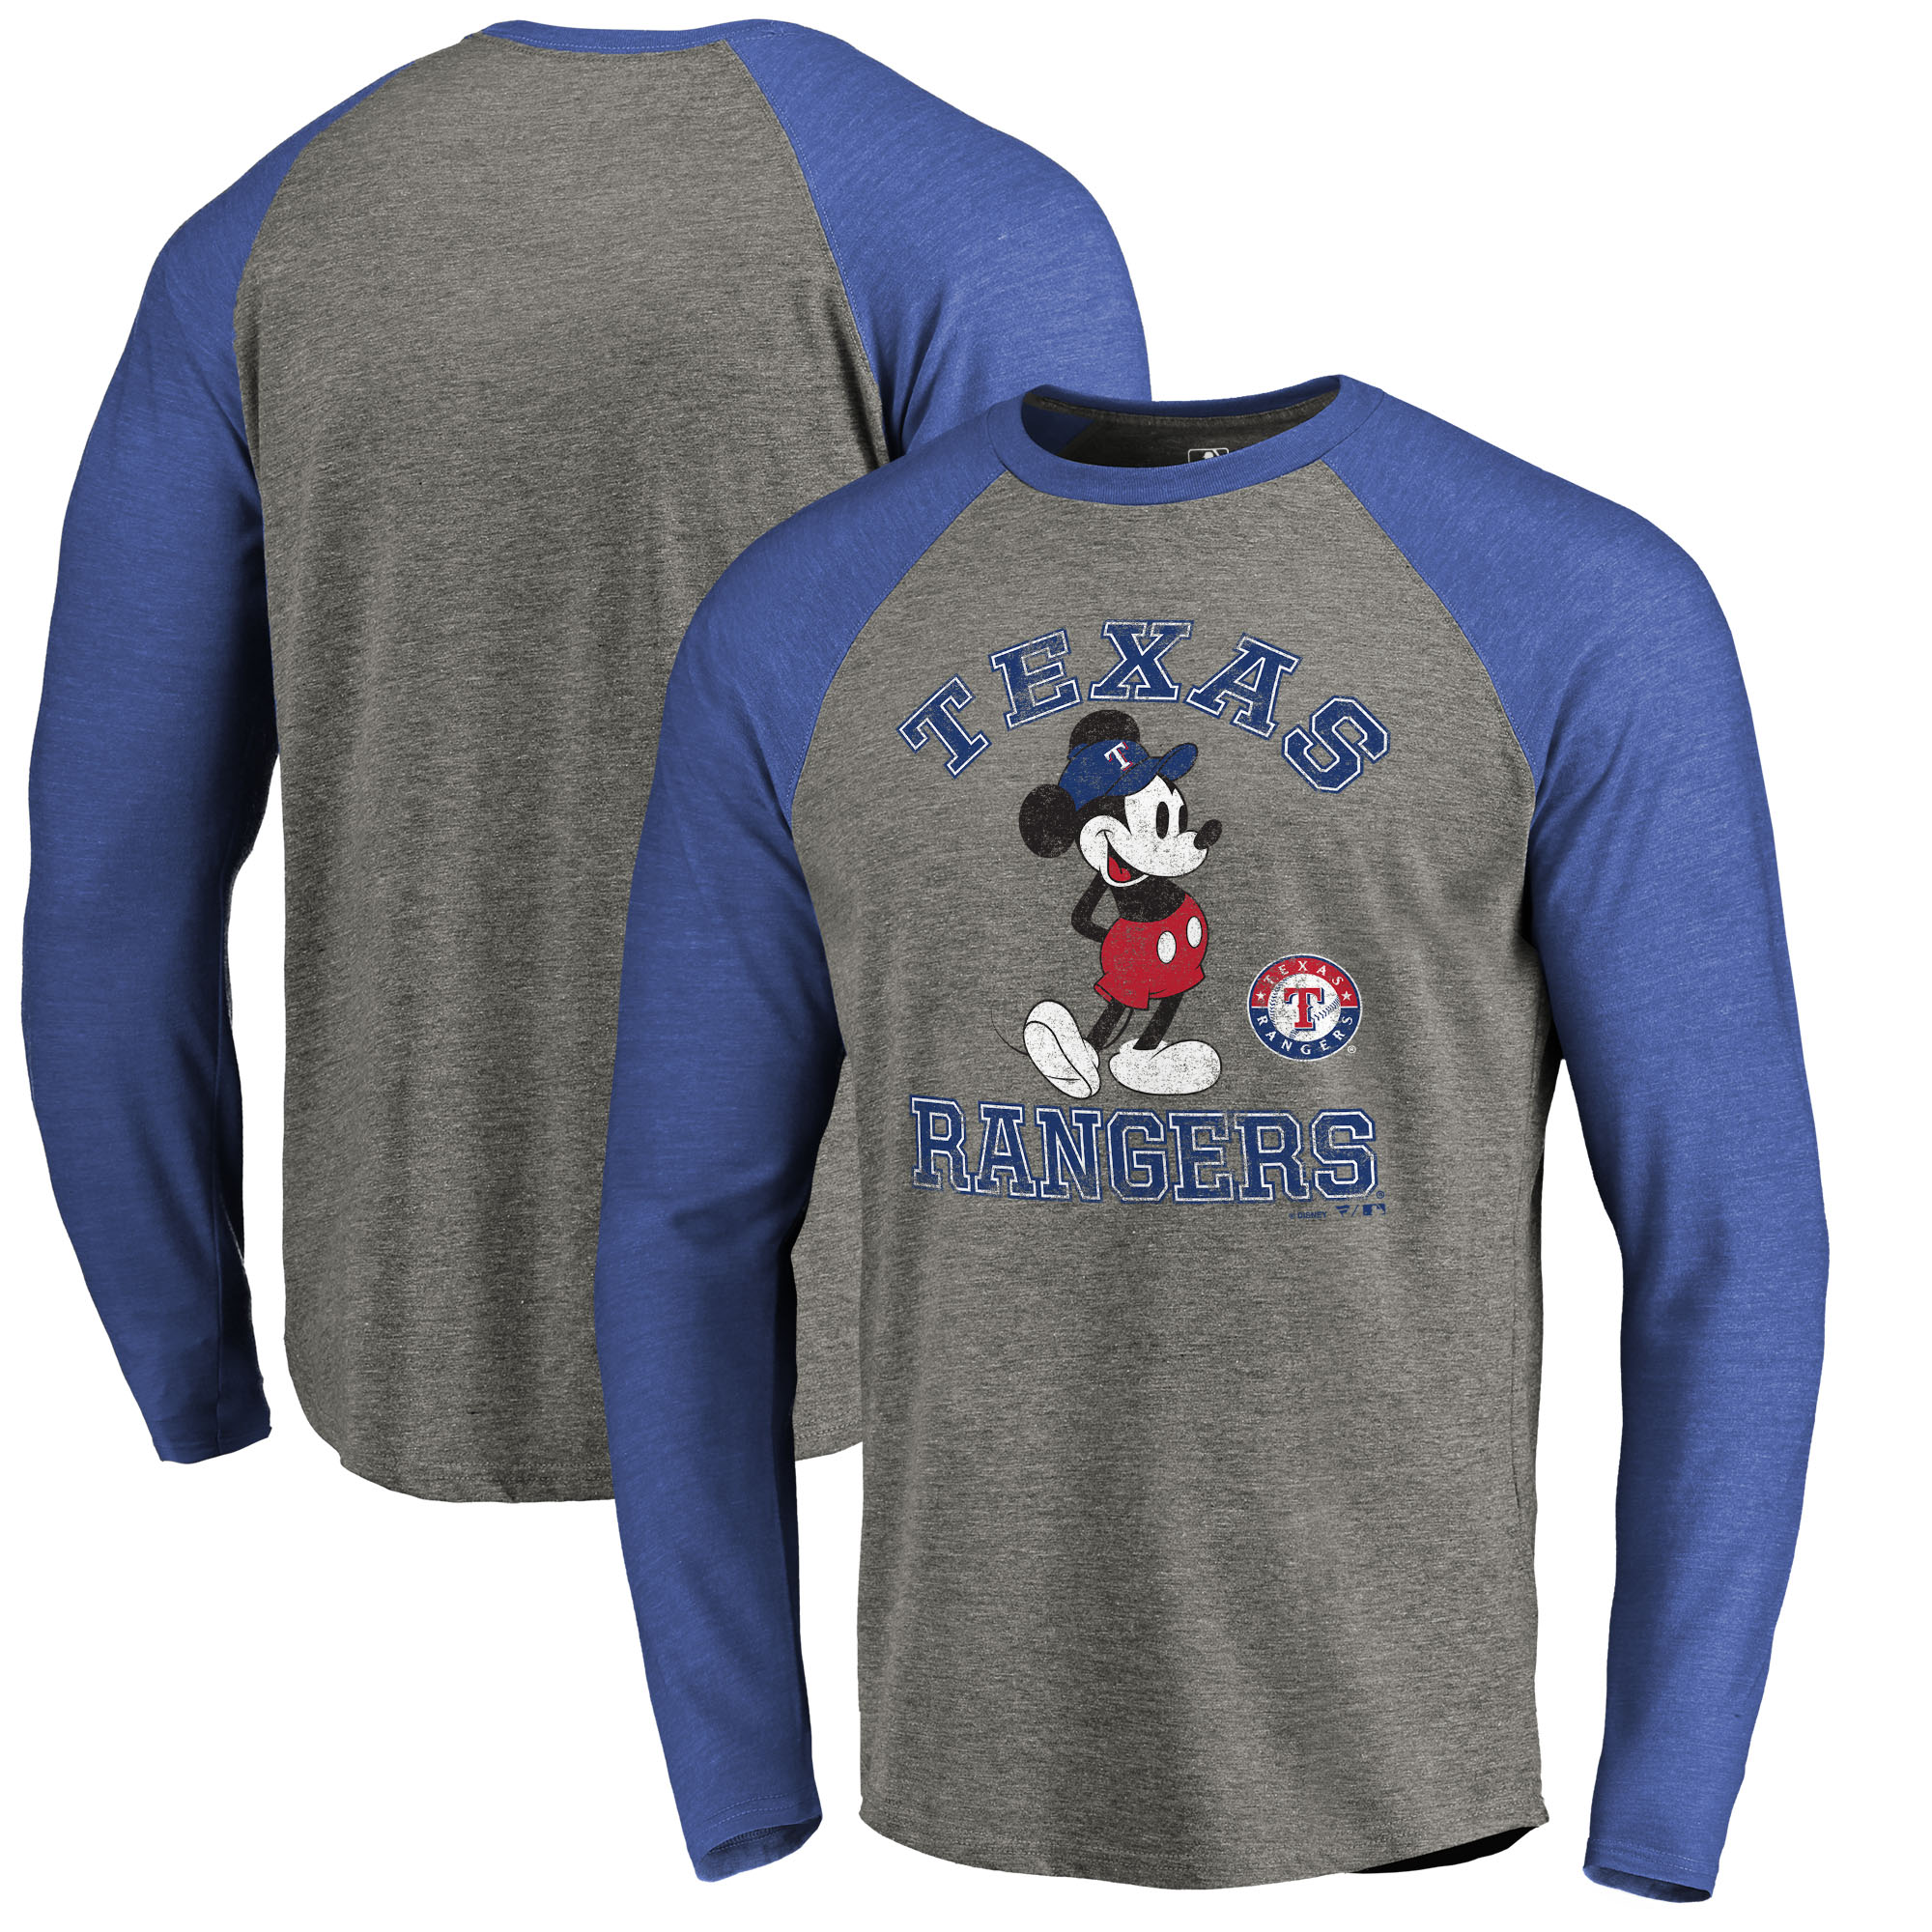 Texas Rangers Fanatics Branded Disney MLB Tradition Long Sleeve Tri-Blend T-Shirt - Heathered Gray